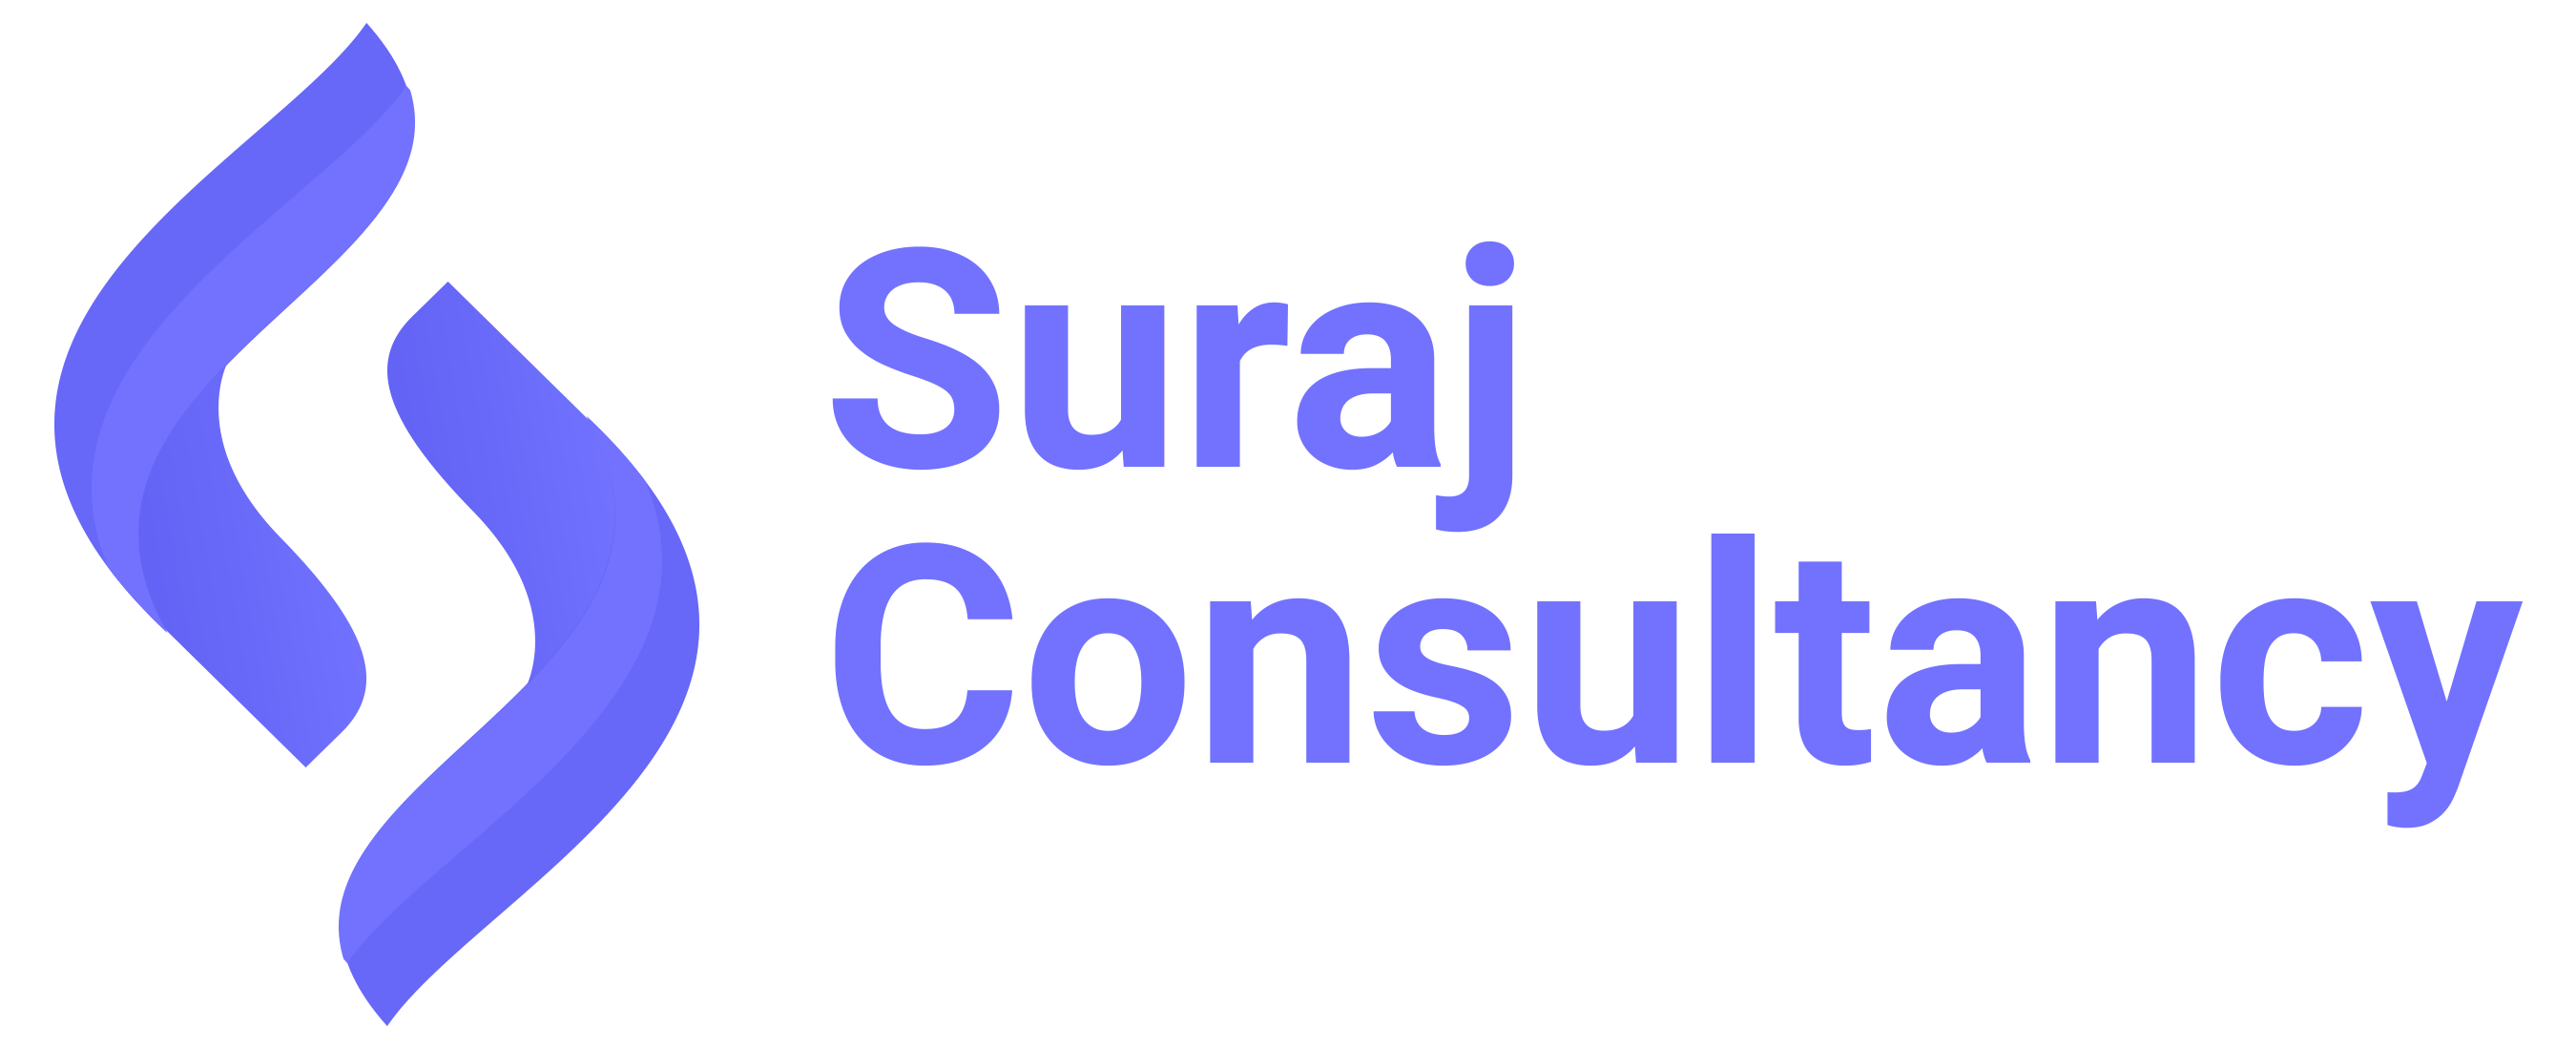 Suraj Consulatncy